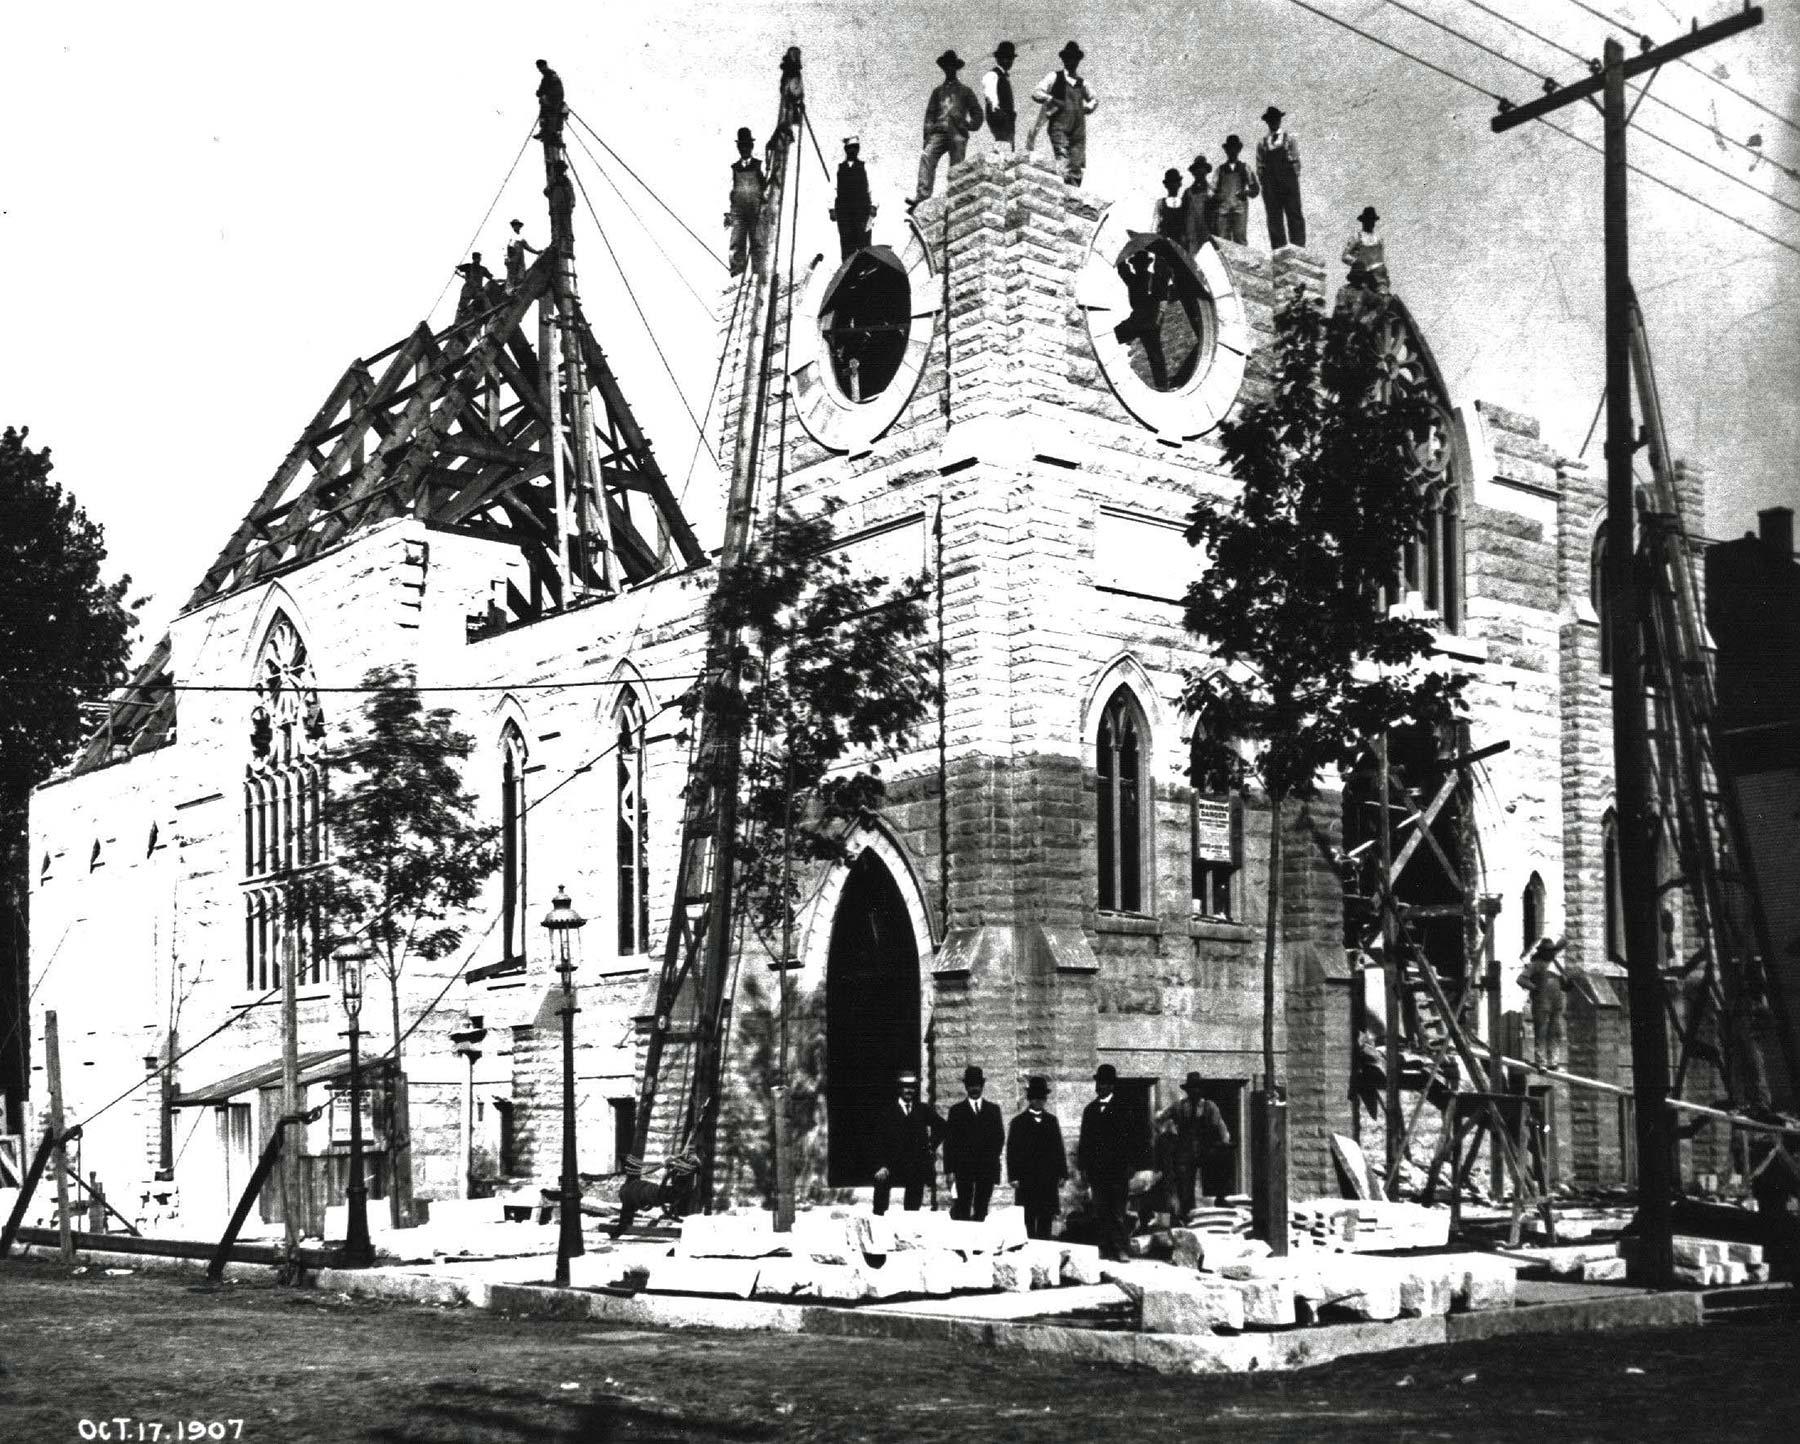 Ebenezer Swedish Lutheran Church during construction, 1907. Photograph courtesy of Chris Kale Corcoran.